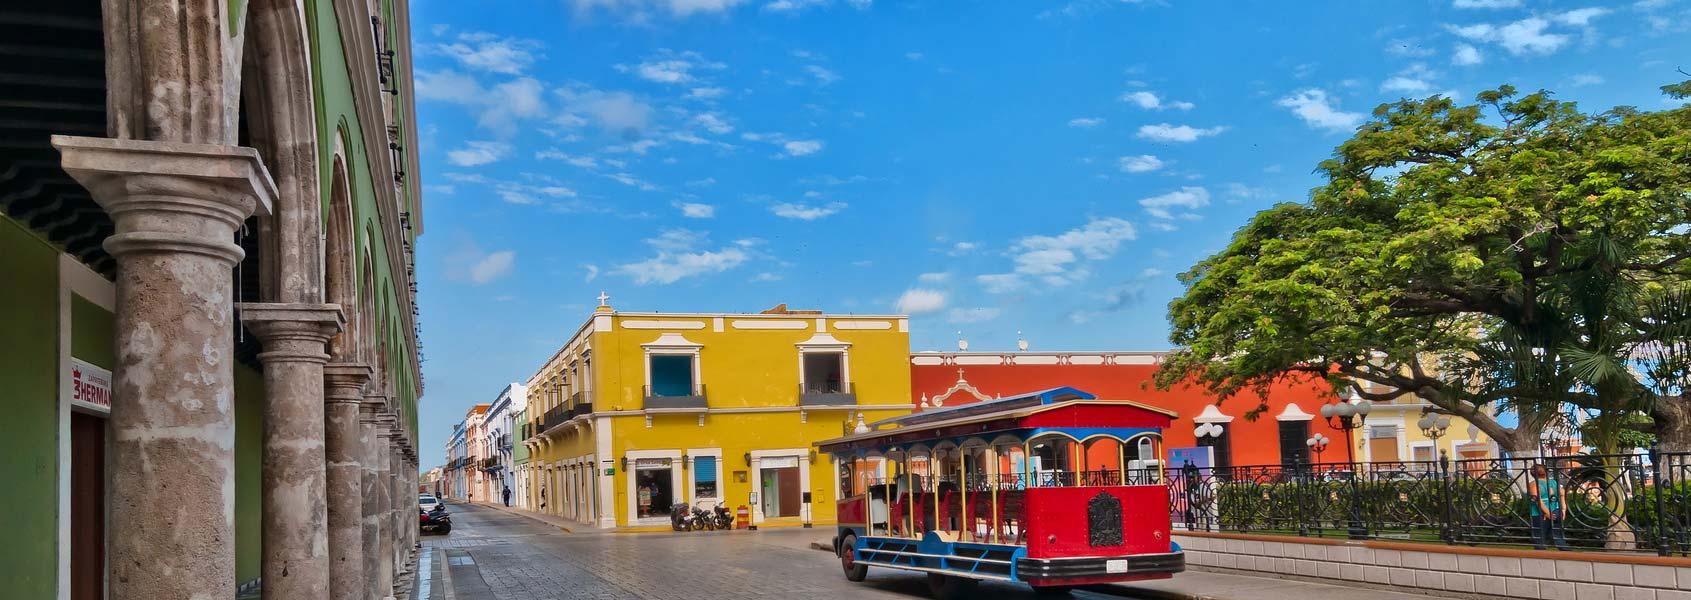 Yucatan Peninsula Campeche Mexico